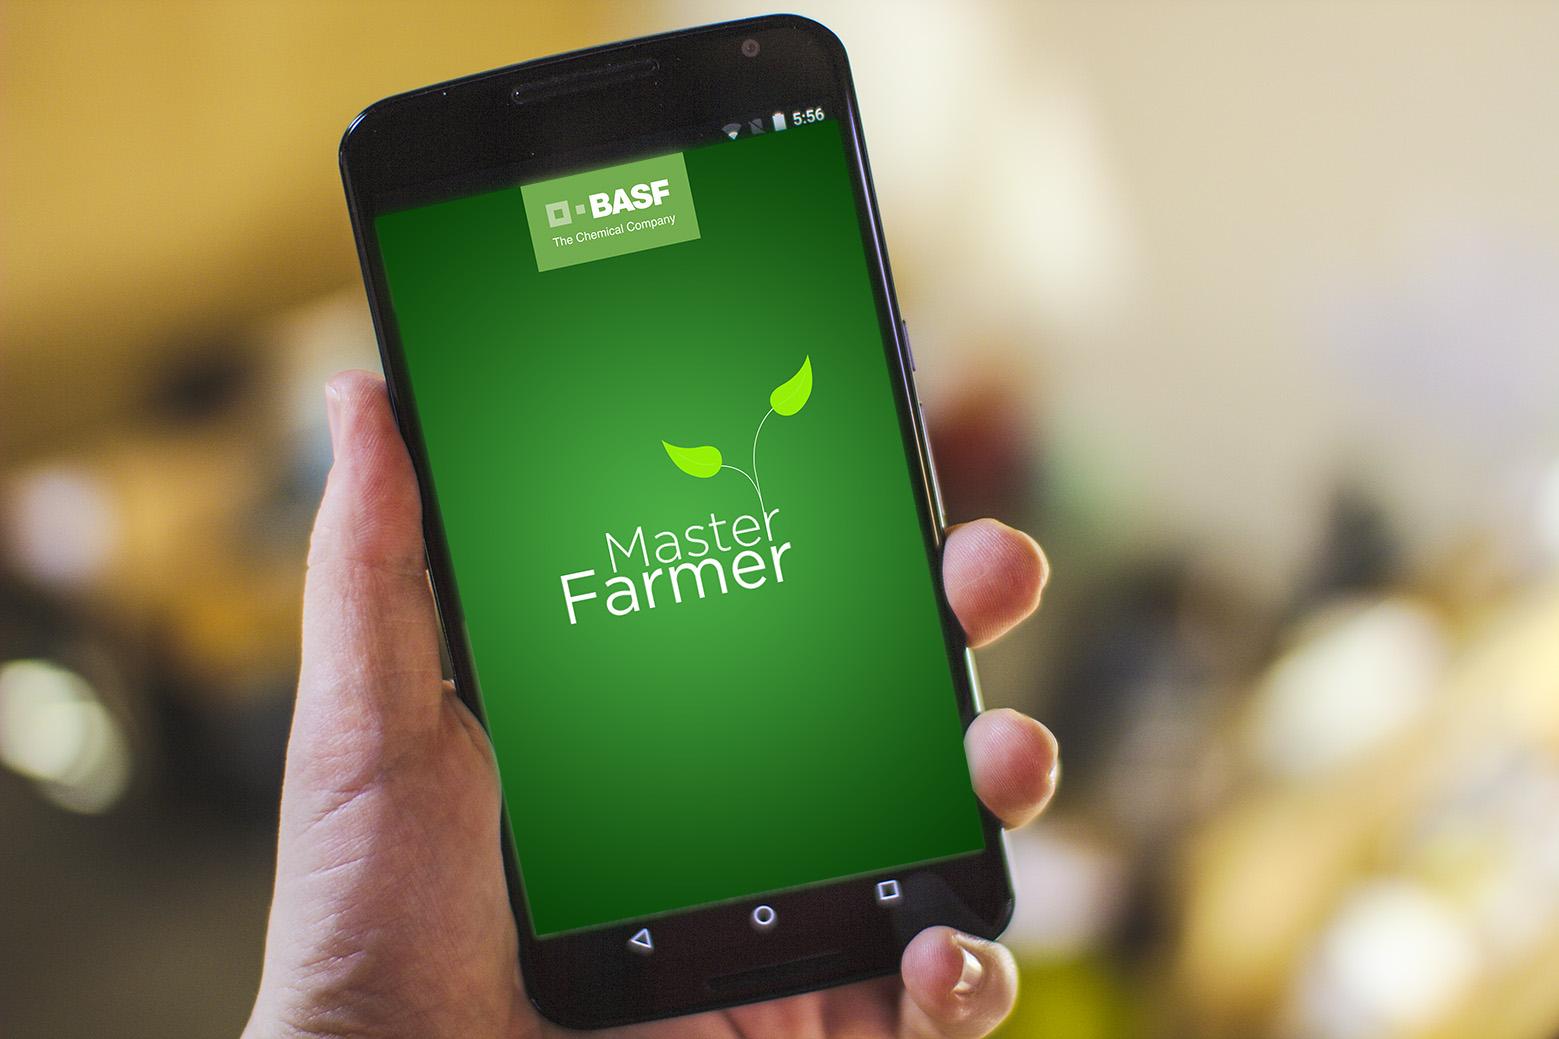 master farmer sim.jpg